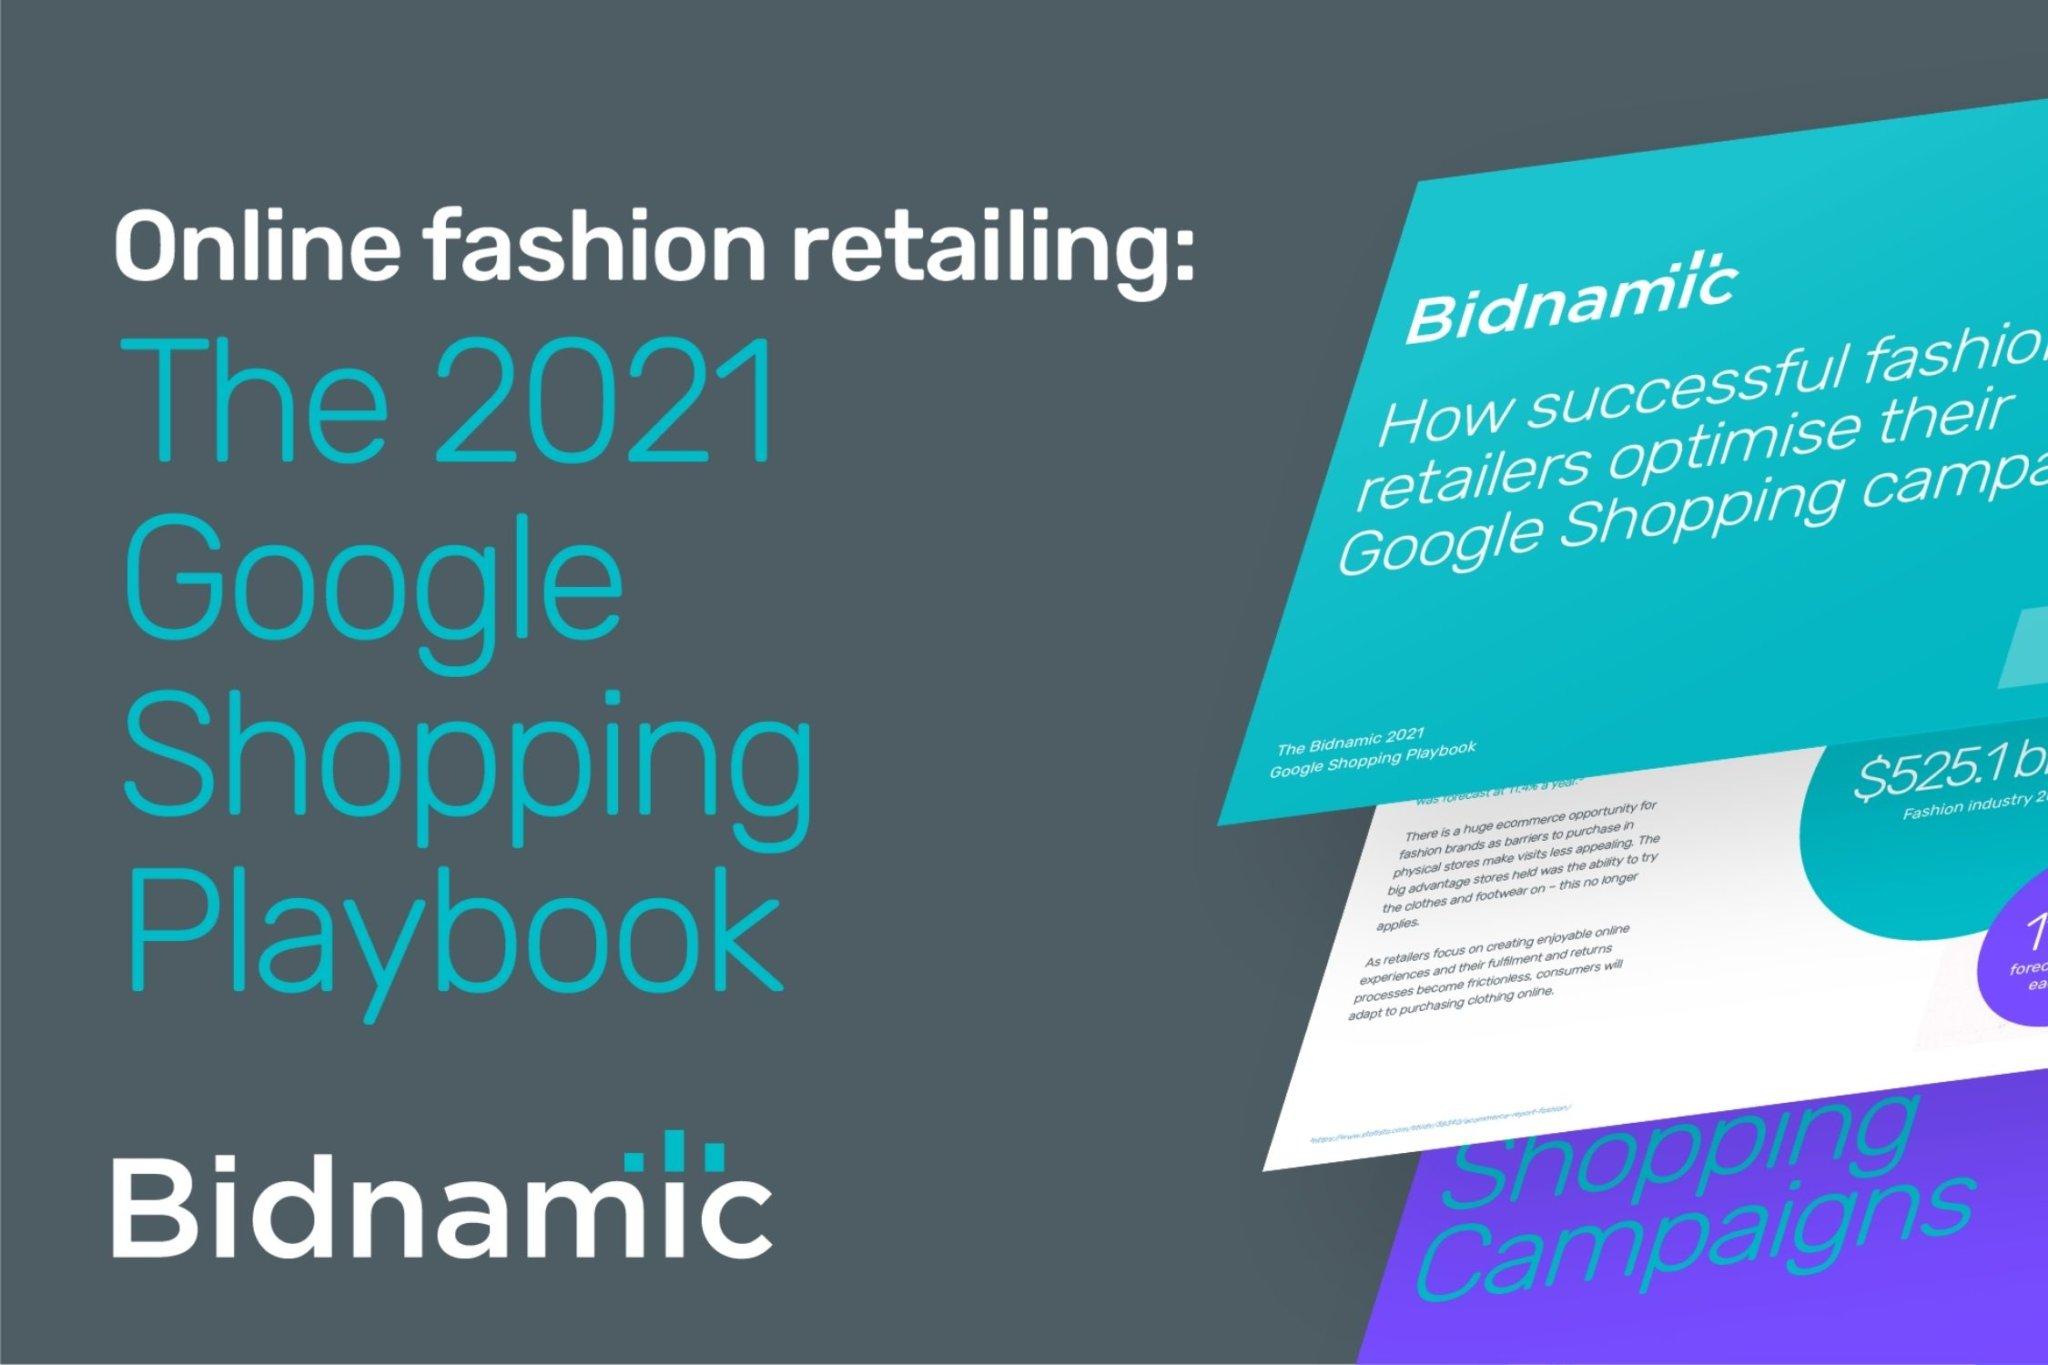 Bidnamic's Google Shopping Playbook for fashion retailers